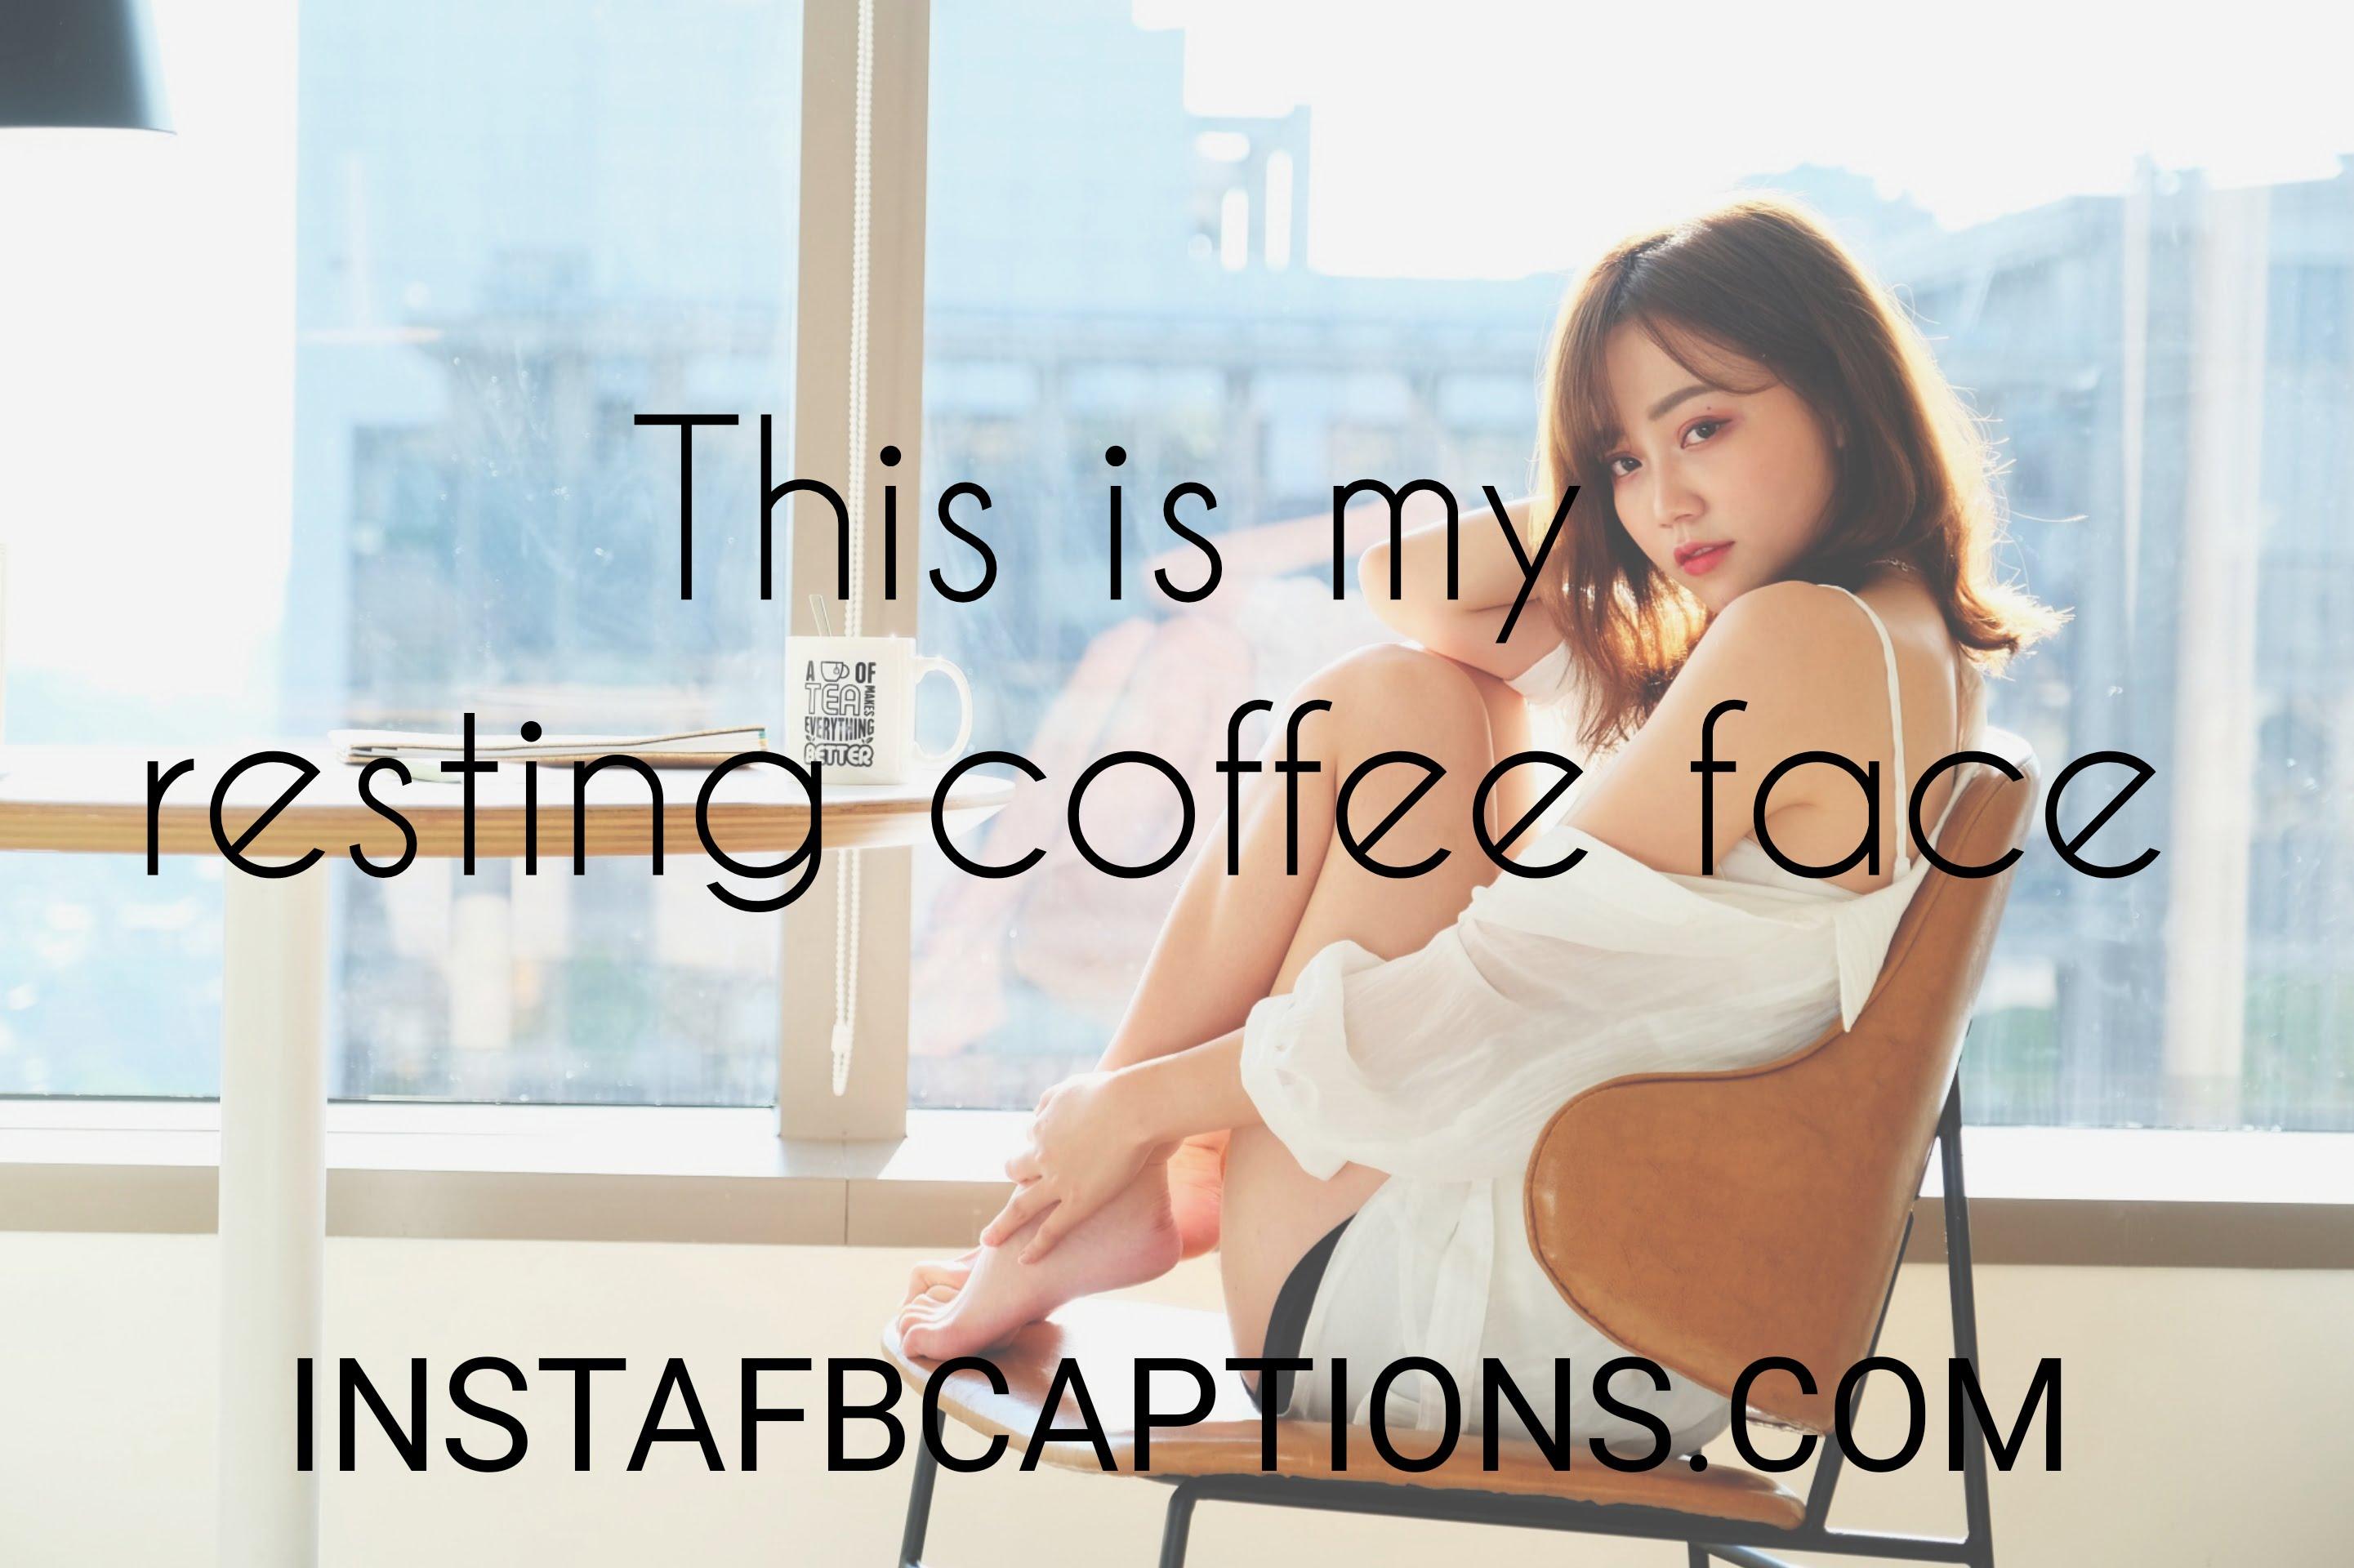 Sitting On Chair Captions  - Sitting on chair captions - 120+ SITTING POSE Instagram captions 2021